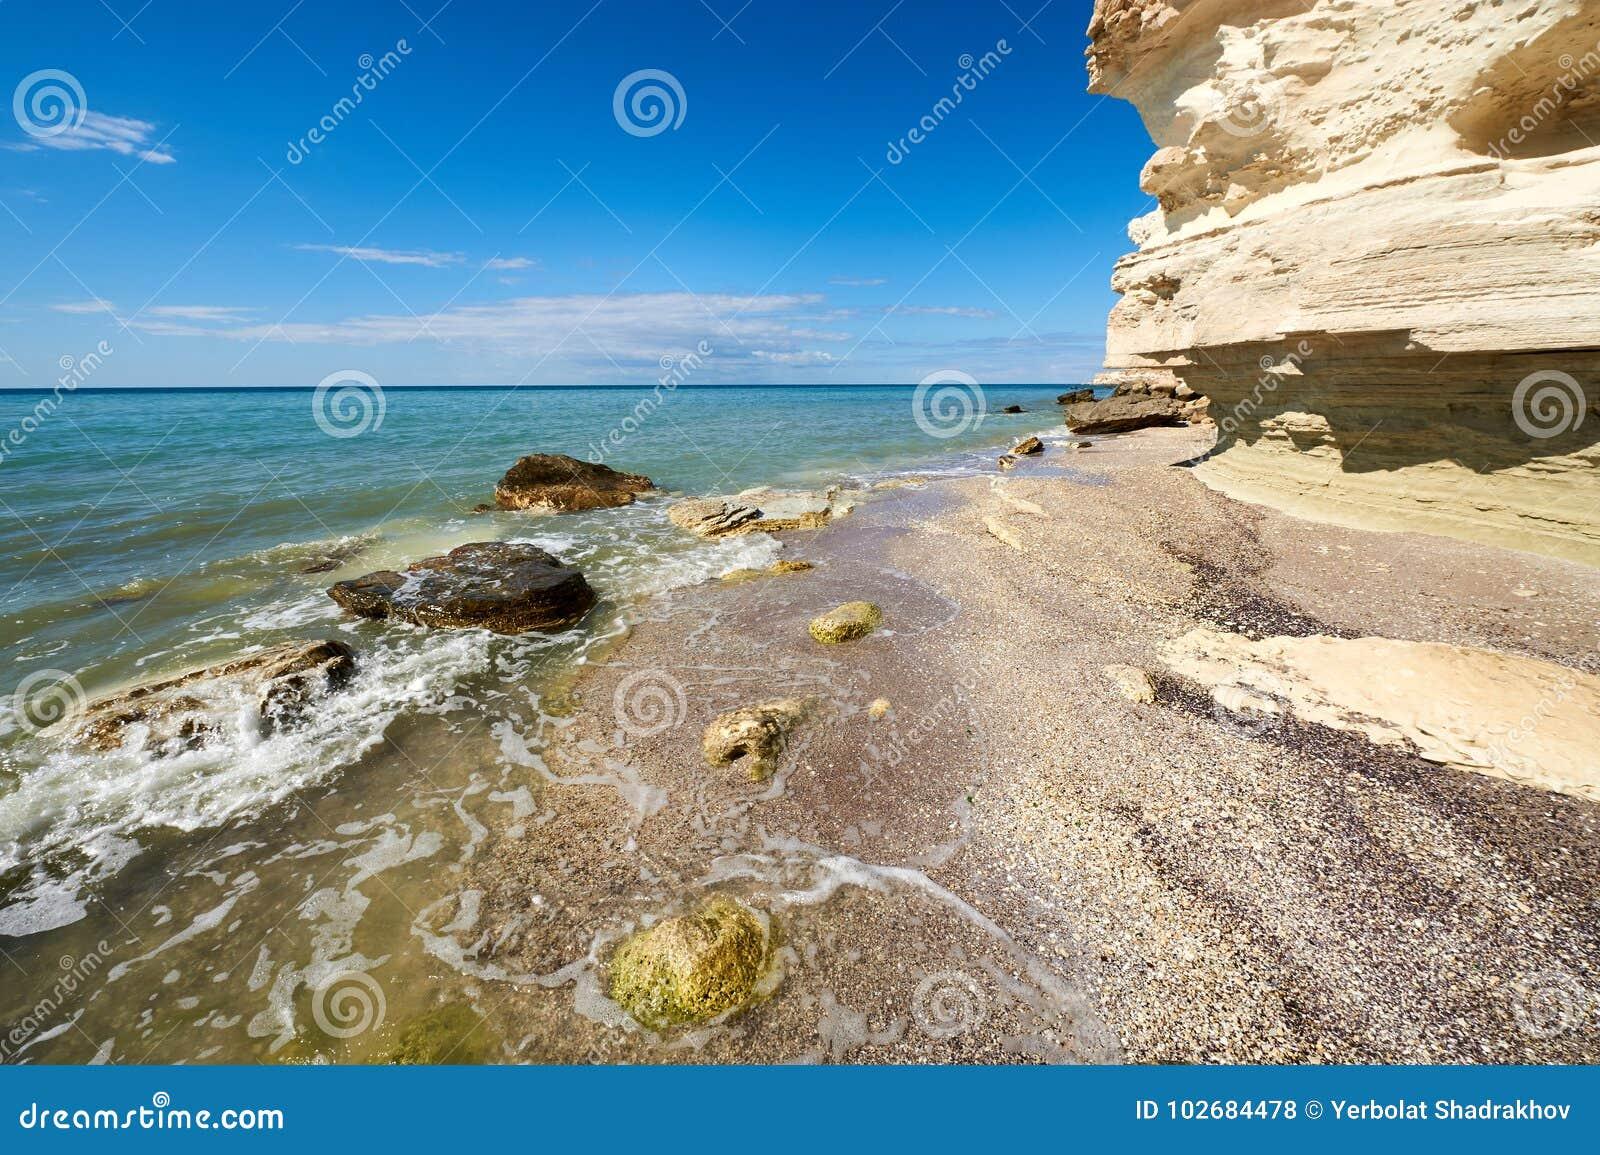 On the shore of the Caspian Sea.